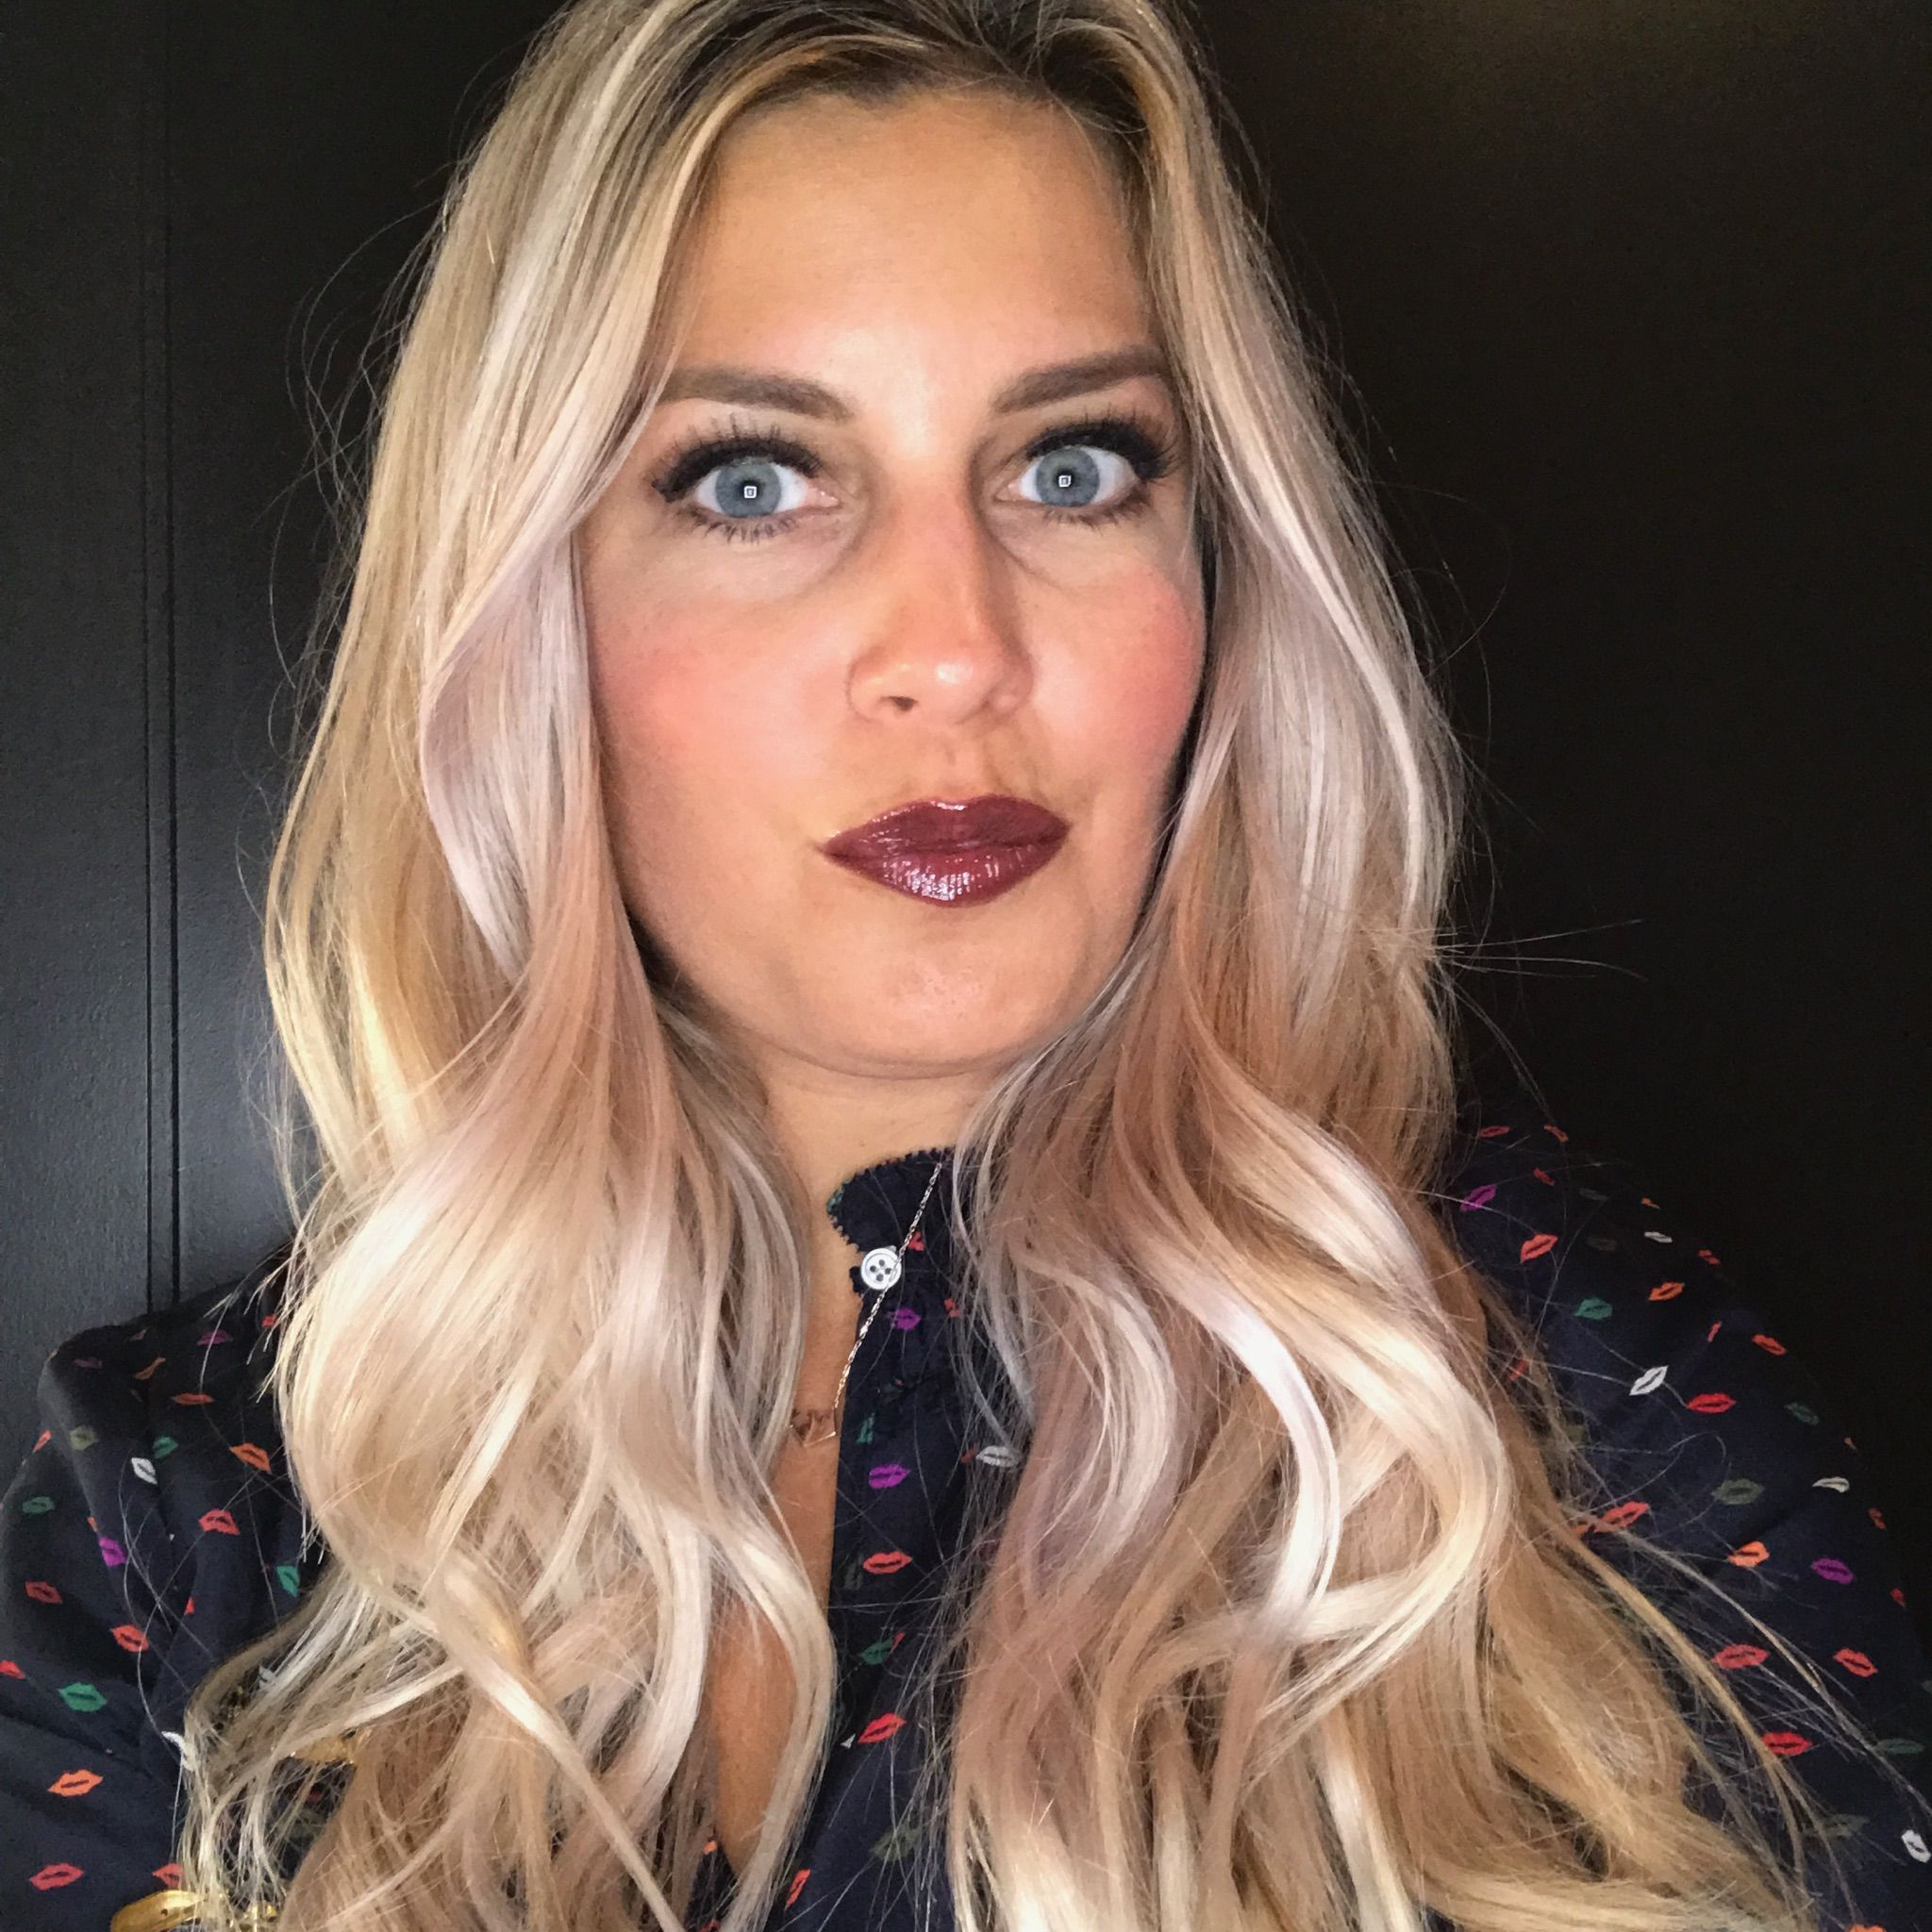 Lipsense Glam Dolls just released!! Perfect berry lip